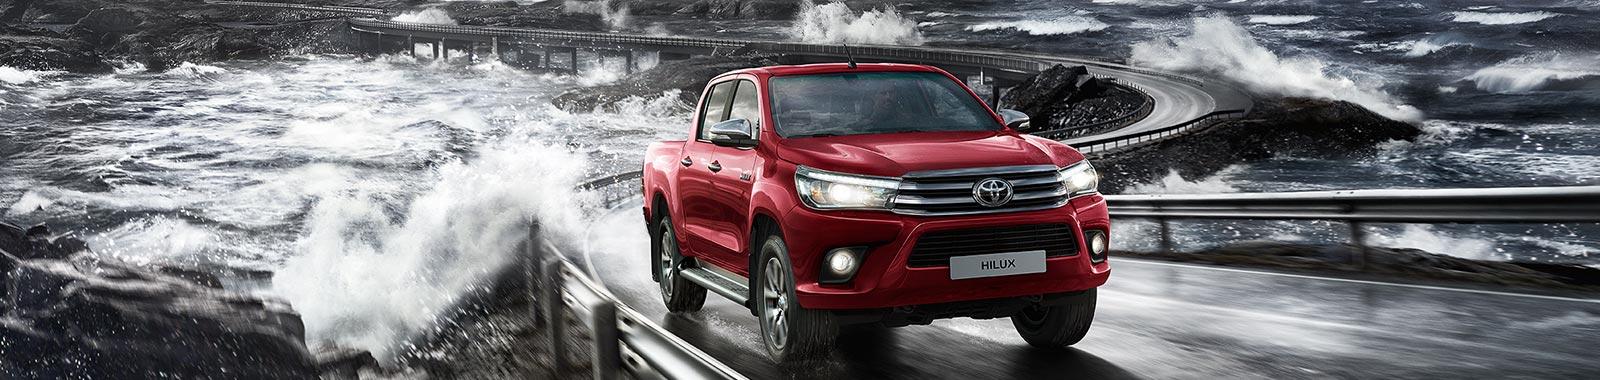 Toyota Hilux 2.4 D-4D A/T 4WD 4 porte Double Cab Executive (Diesel) - Dimensioni, Consumi e Dotazioni di serie